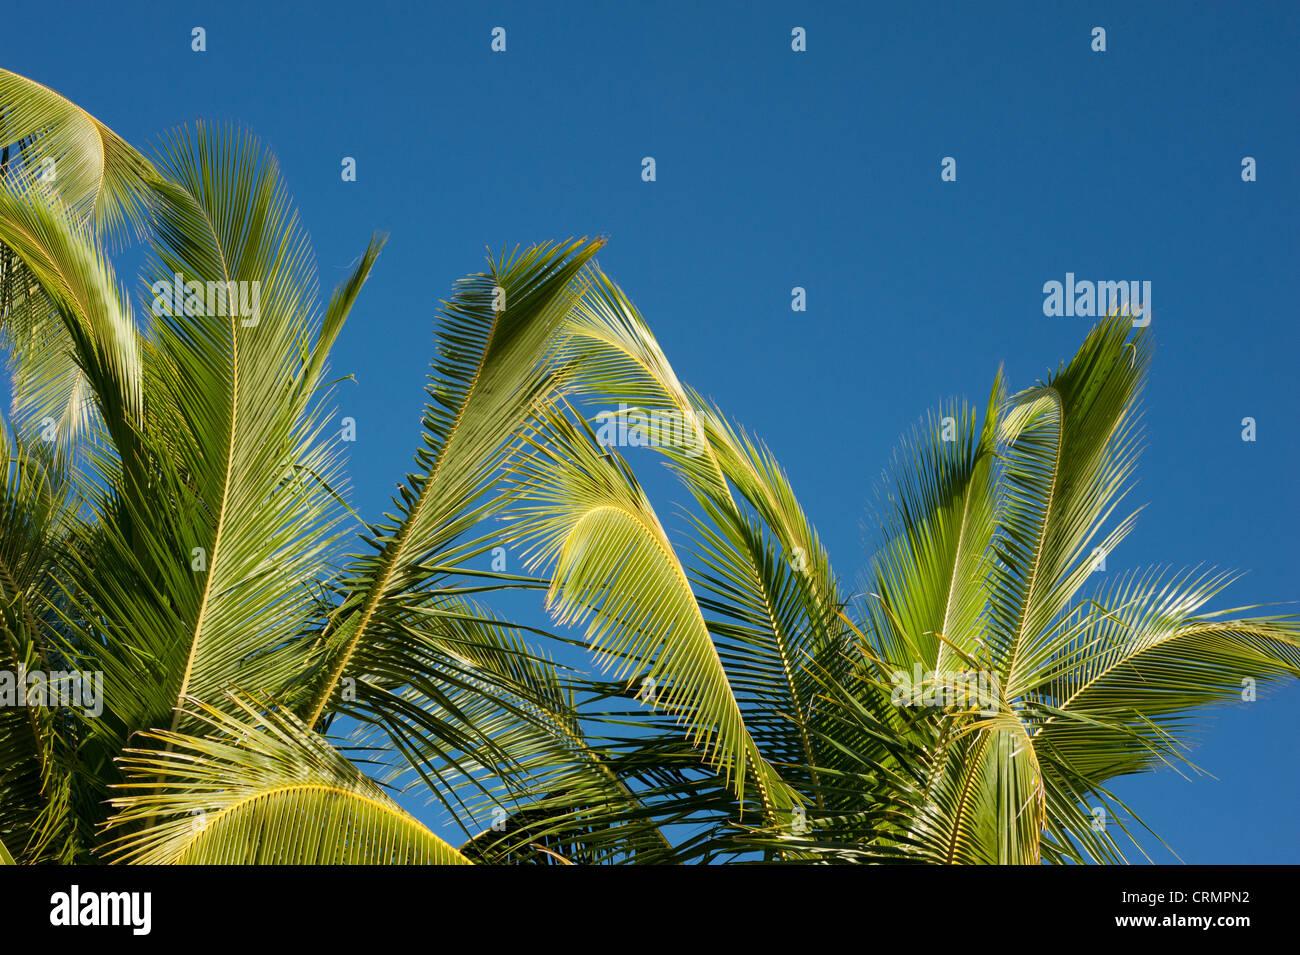 Beach Palm Trees Costa Rica Stock Photos & Beach Palm Trees Costa ...